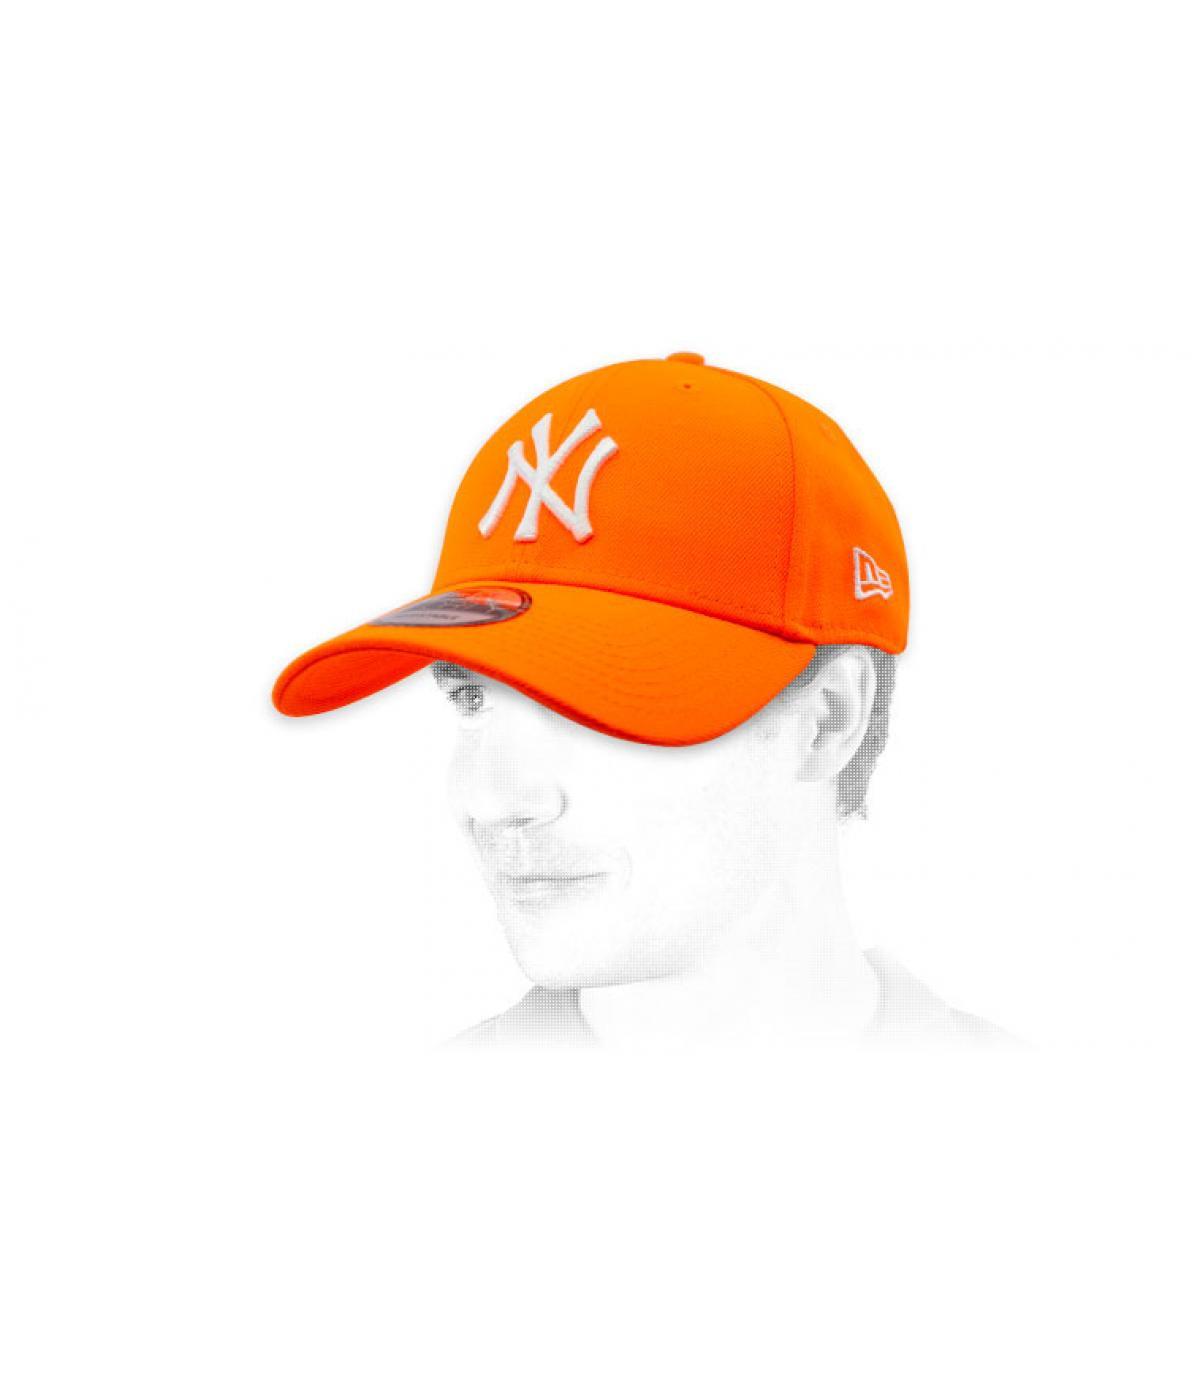 Cappellino NY arancione fluo